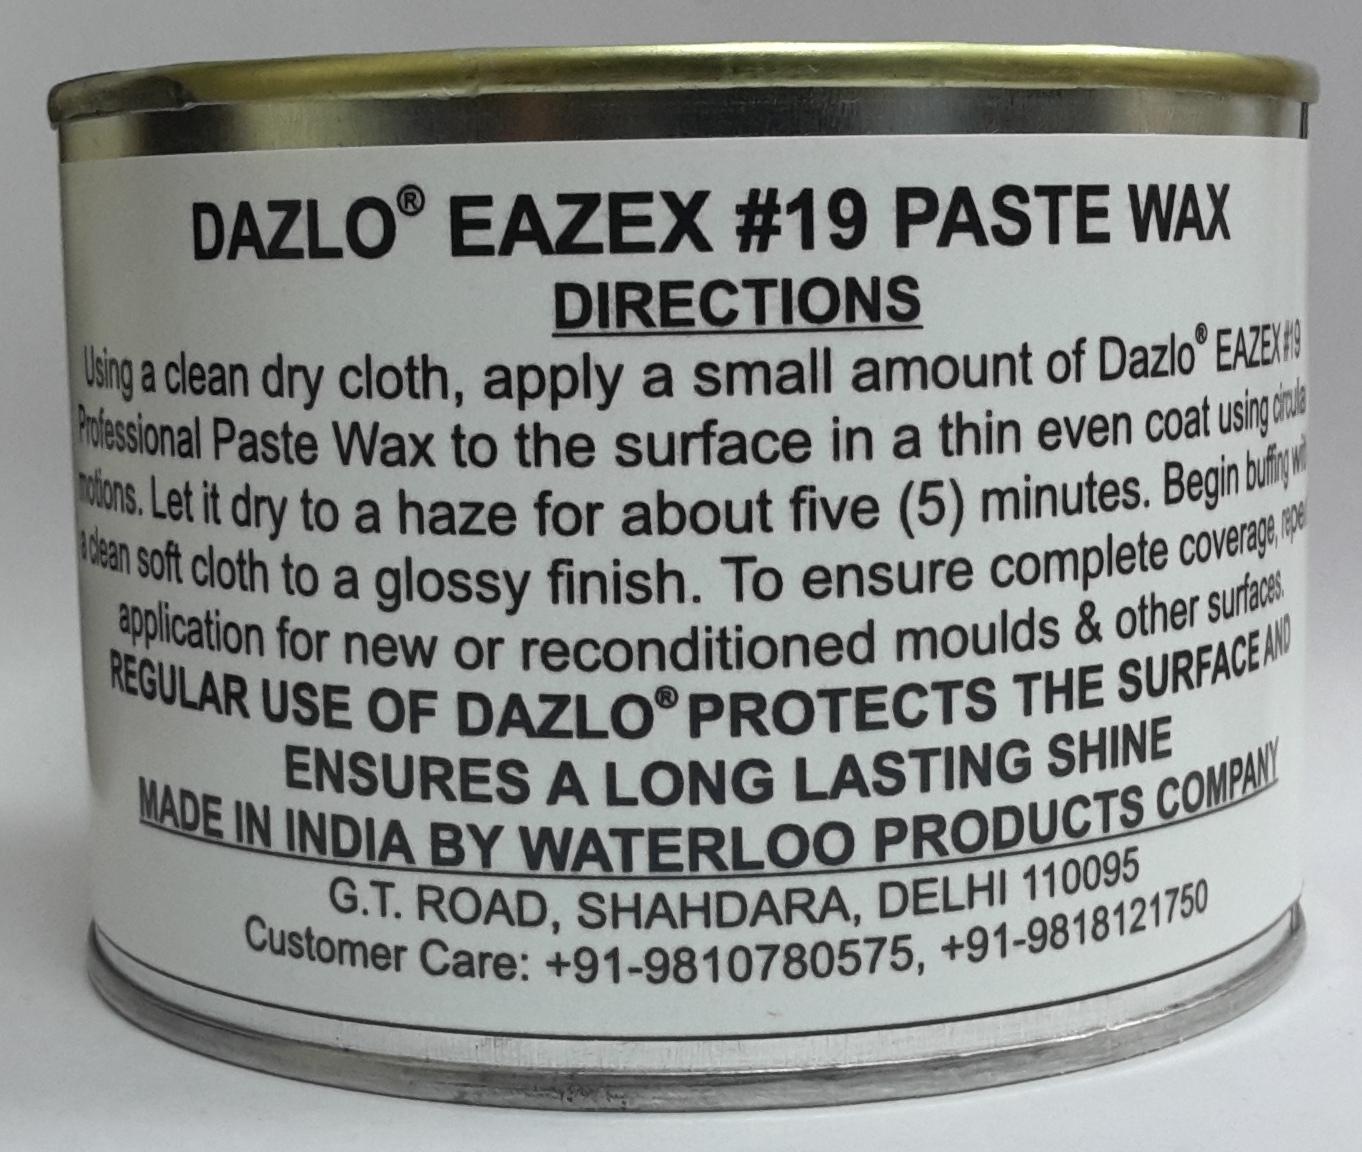 Mould Release Agent | Wax | Mold | FRP | Dazlo | Manufacurer